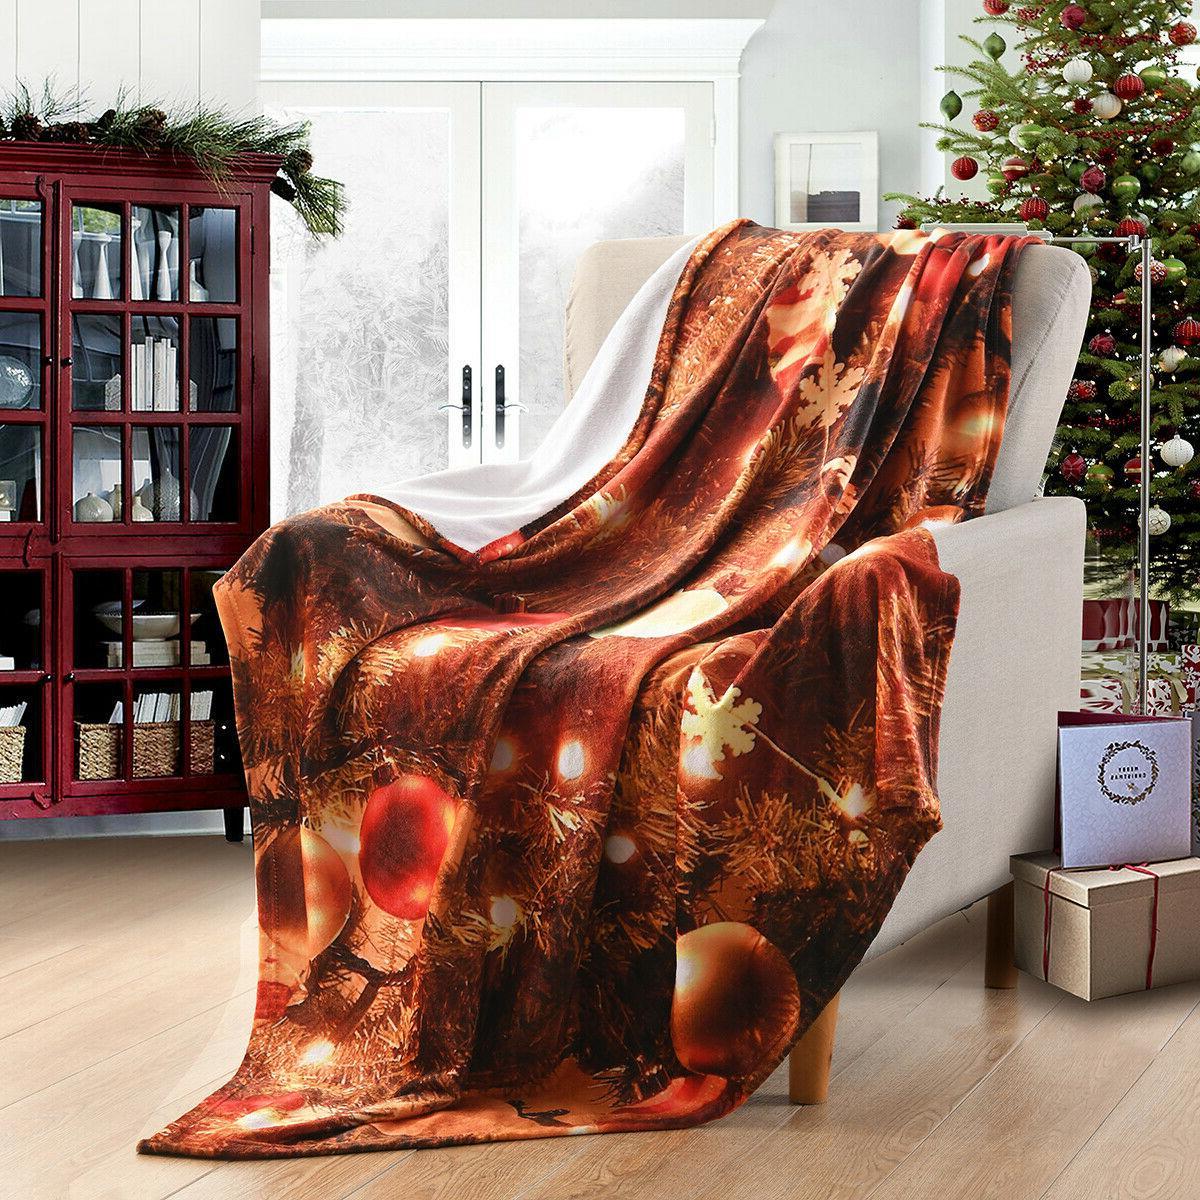 "Holiday Fleece Fuzzy Warm Gift 50""x"